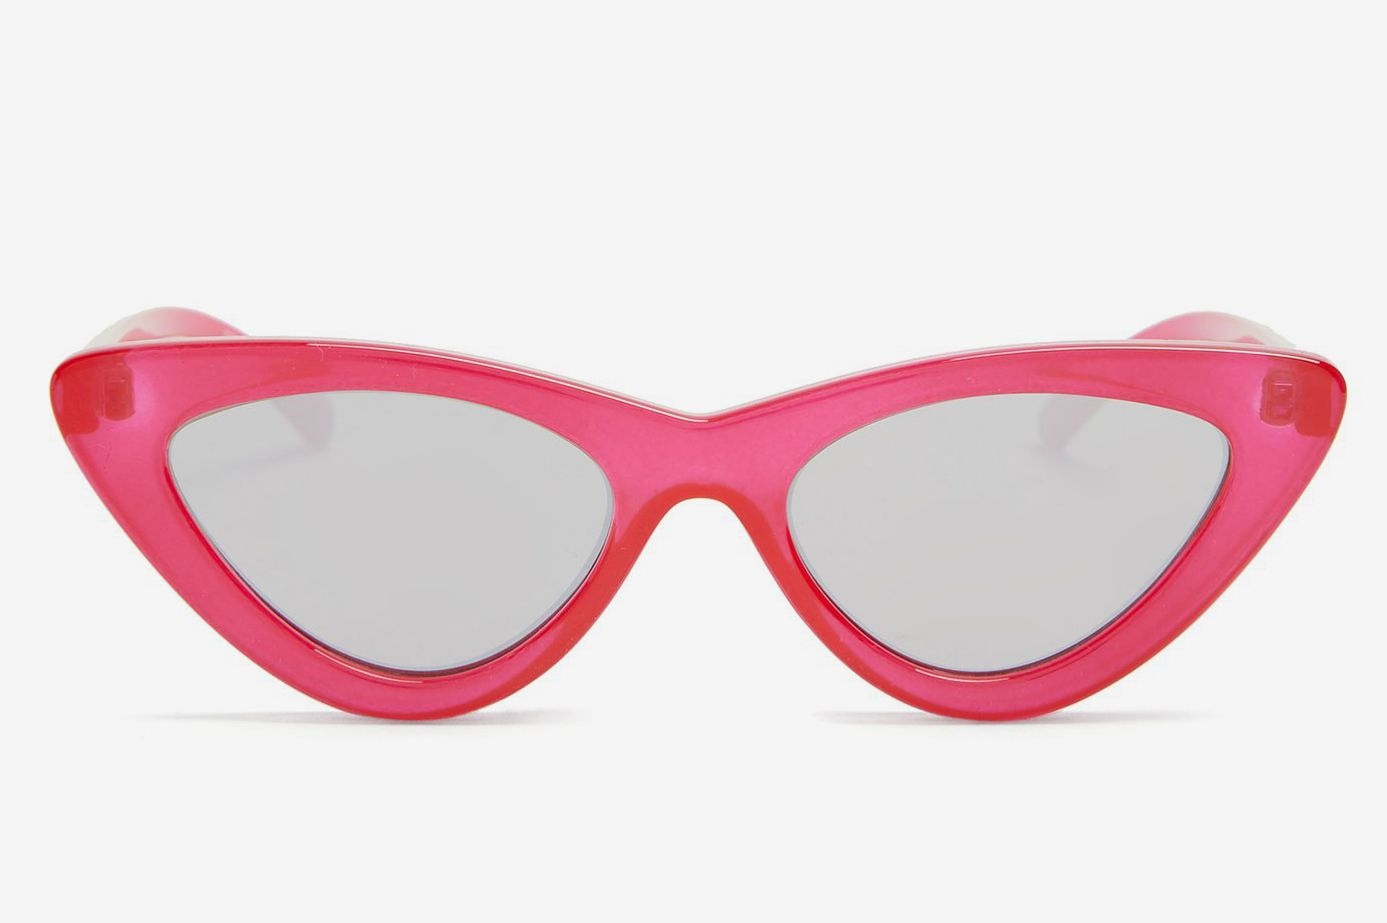 Le Specs Luxe Adam Selman x Le Specs Luxe the Last Lolita Pink Sunglasses